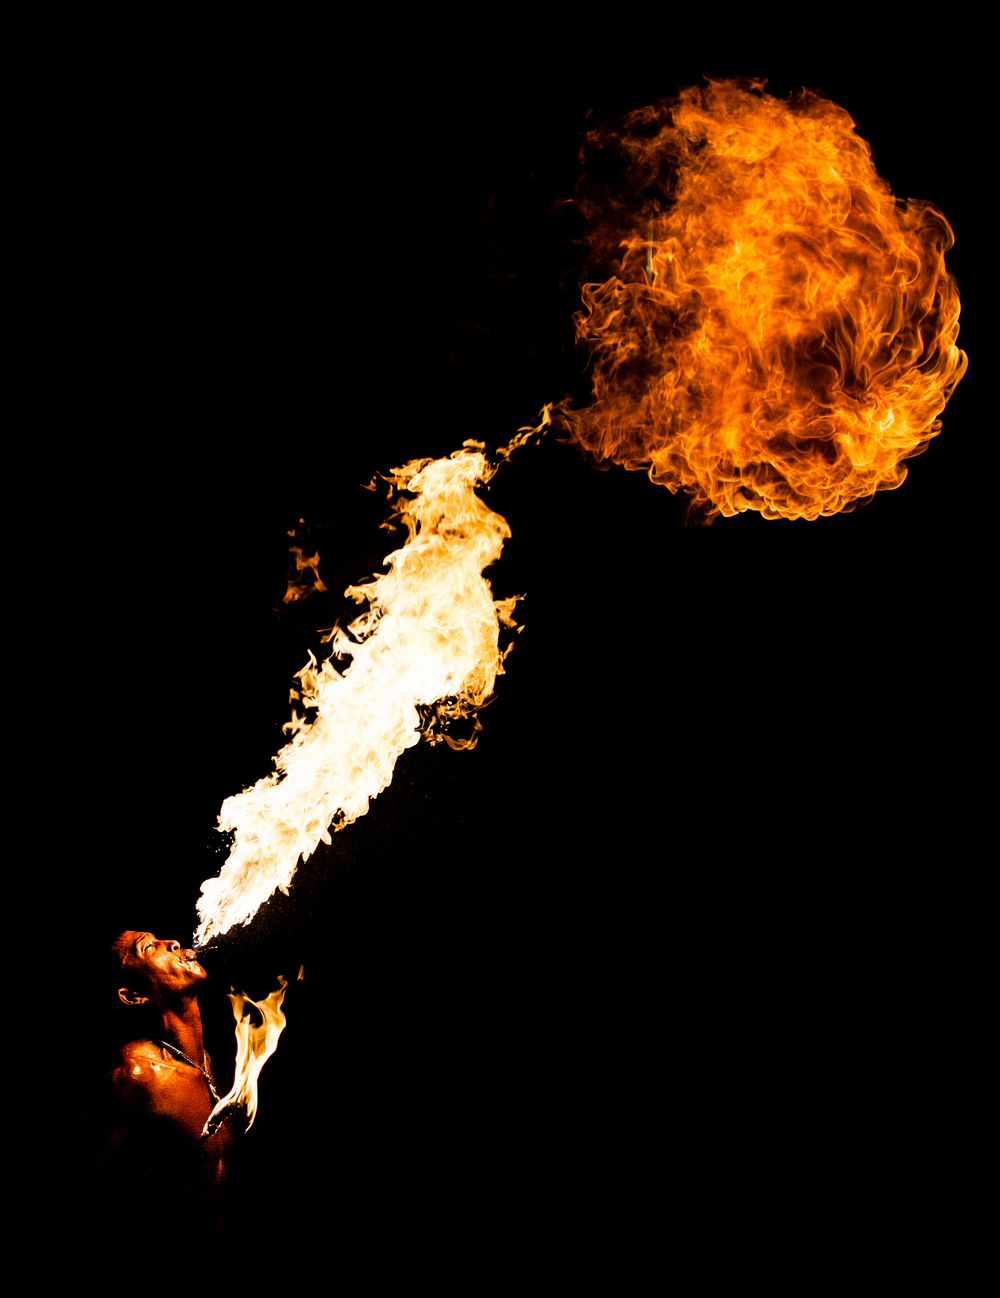 week-47---firestarter_15602663196_o.jpg